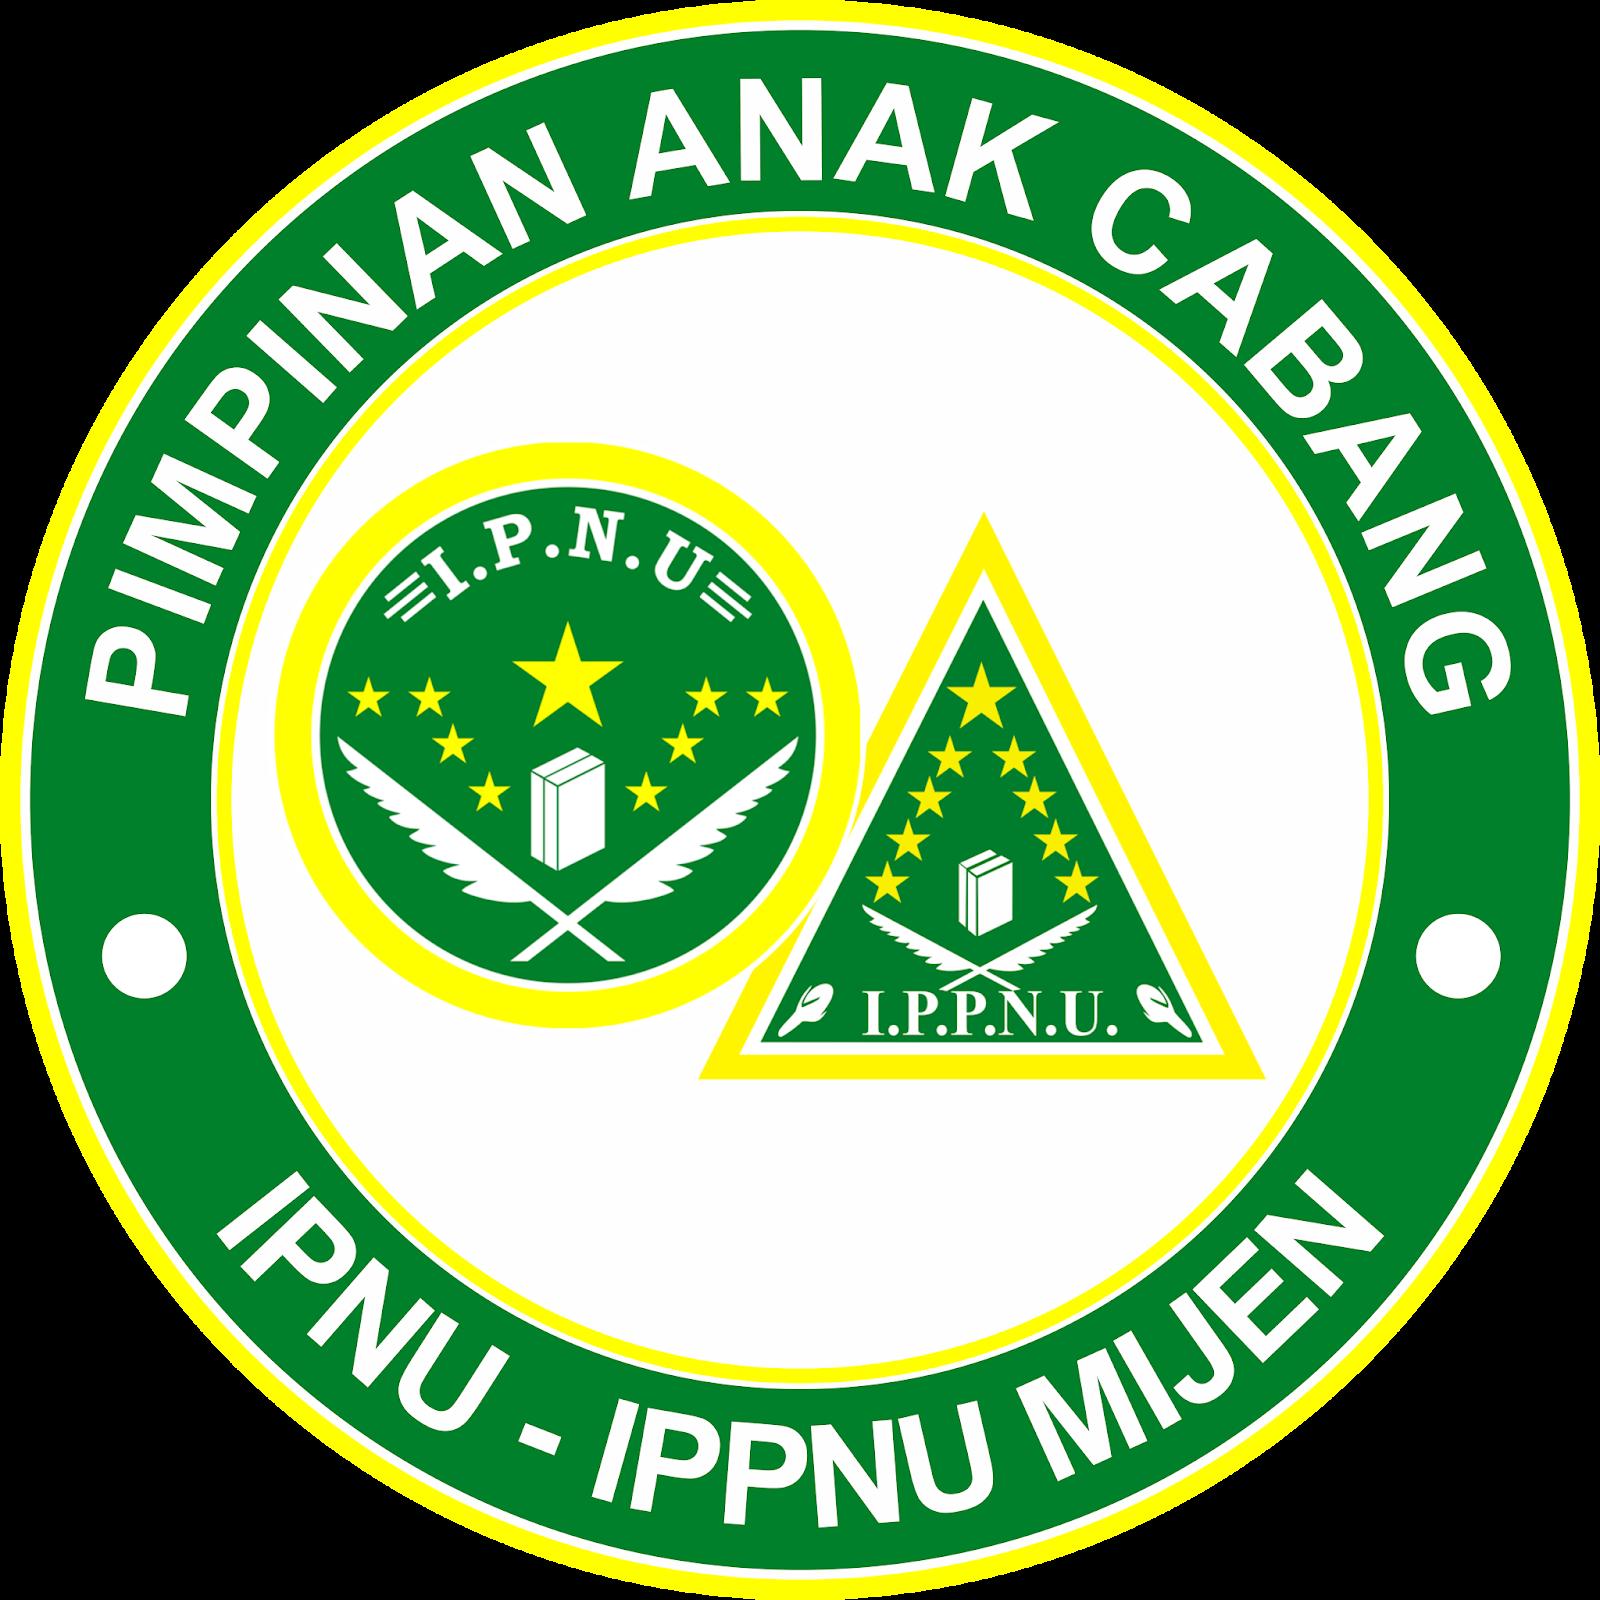 Logo Ippnu Terbaru 37